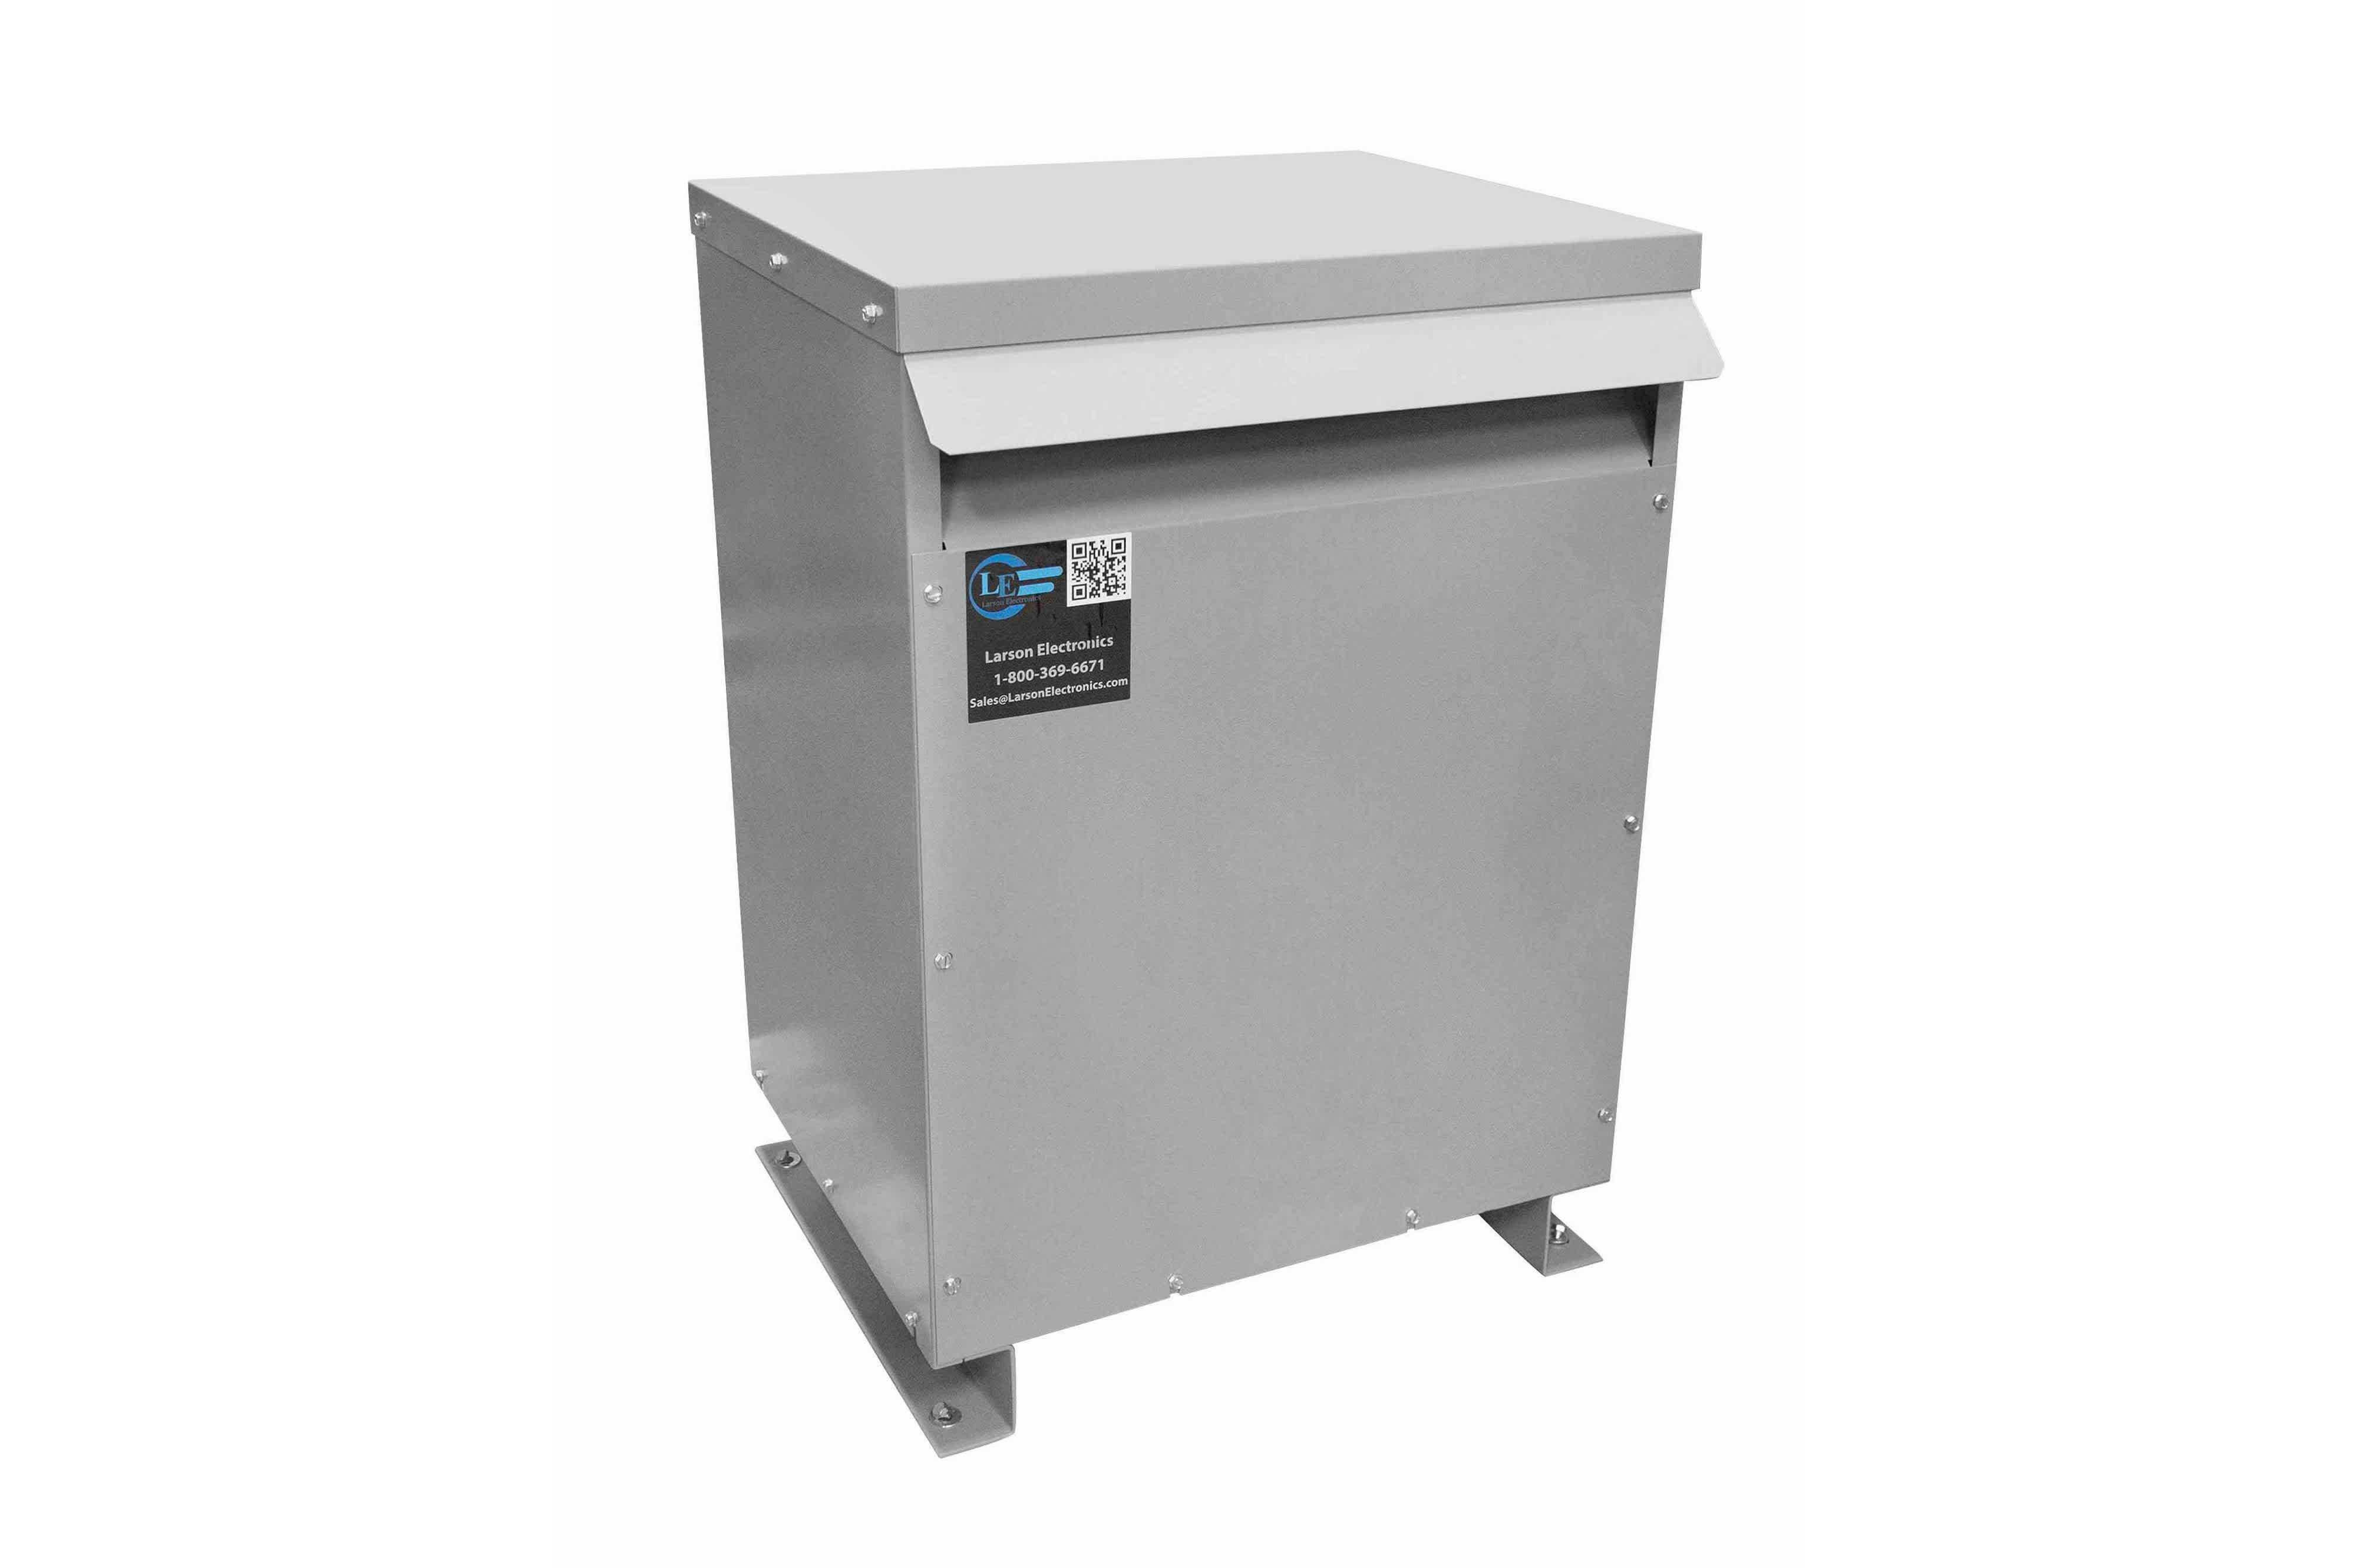 500 kVA 3PH DOE Transformer, 208V Delta Primary, 208Y/120 Wye-N Secondary, N3R, Ventilated, 60 Hz